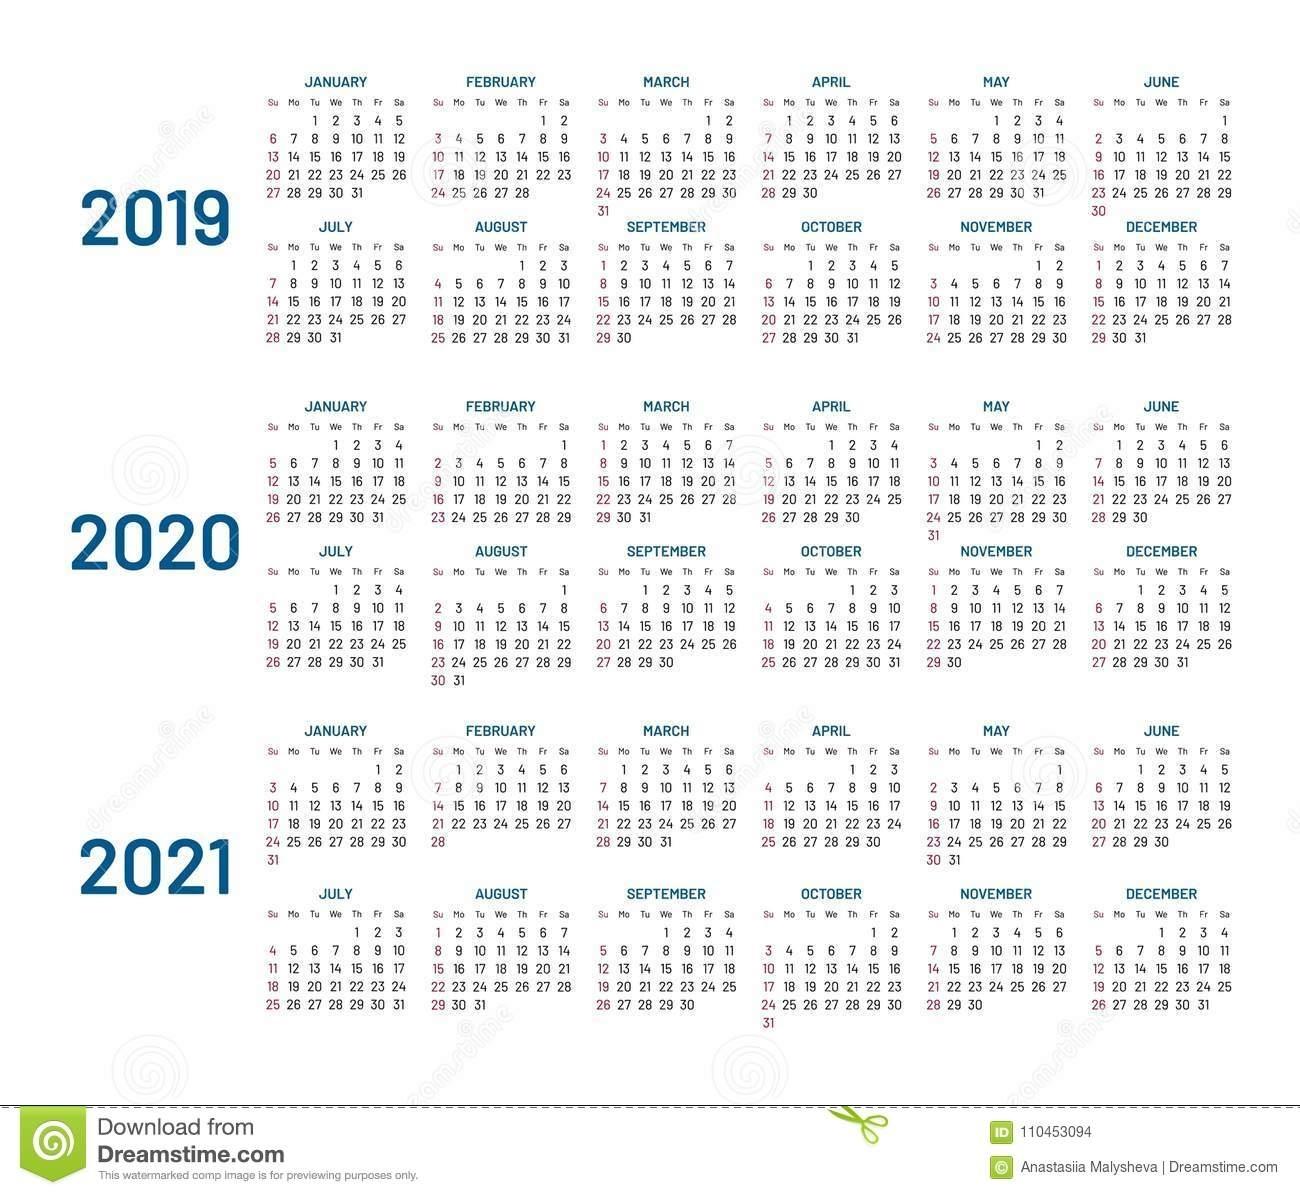 Three Years Calendar, 2019, 2020, 2021, Isolated, Flat Stock